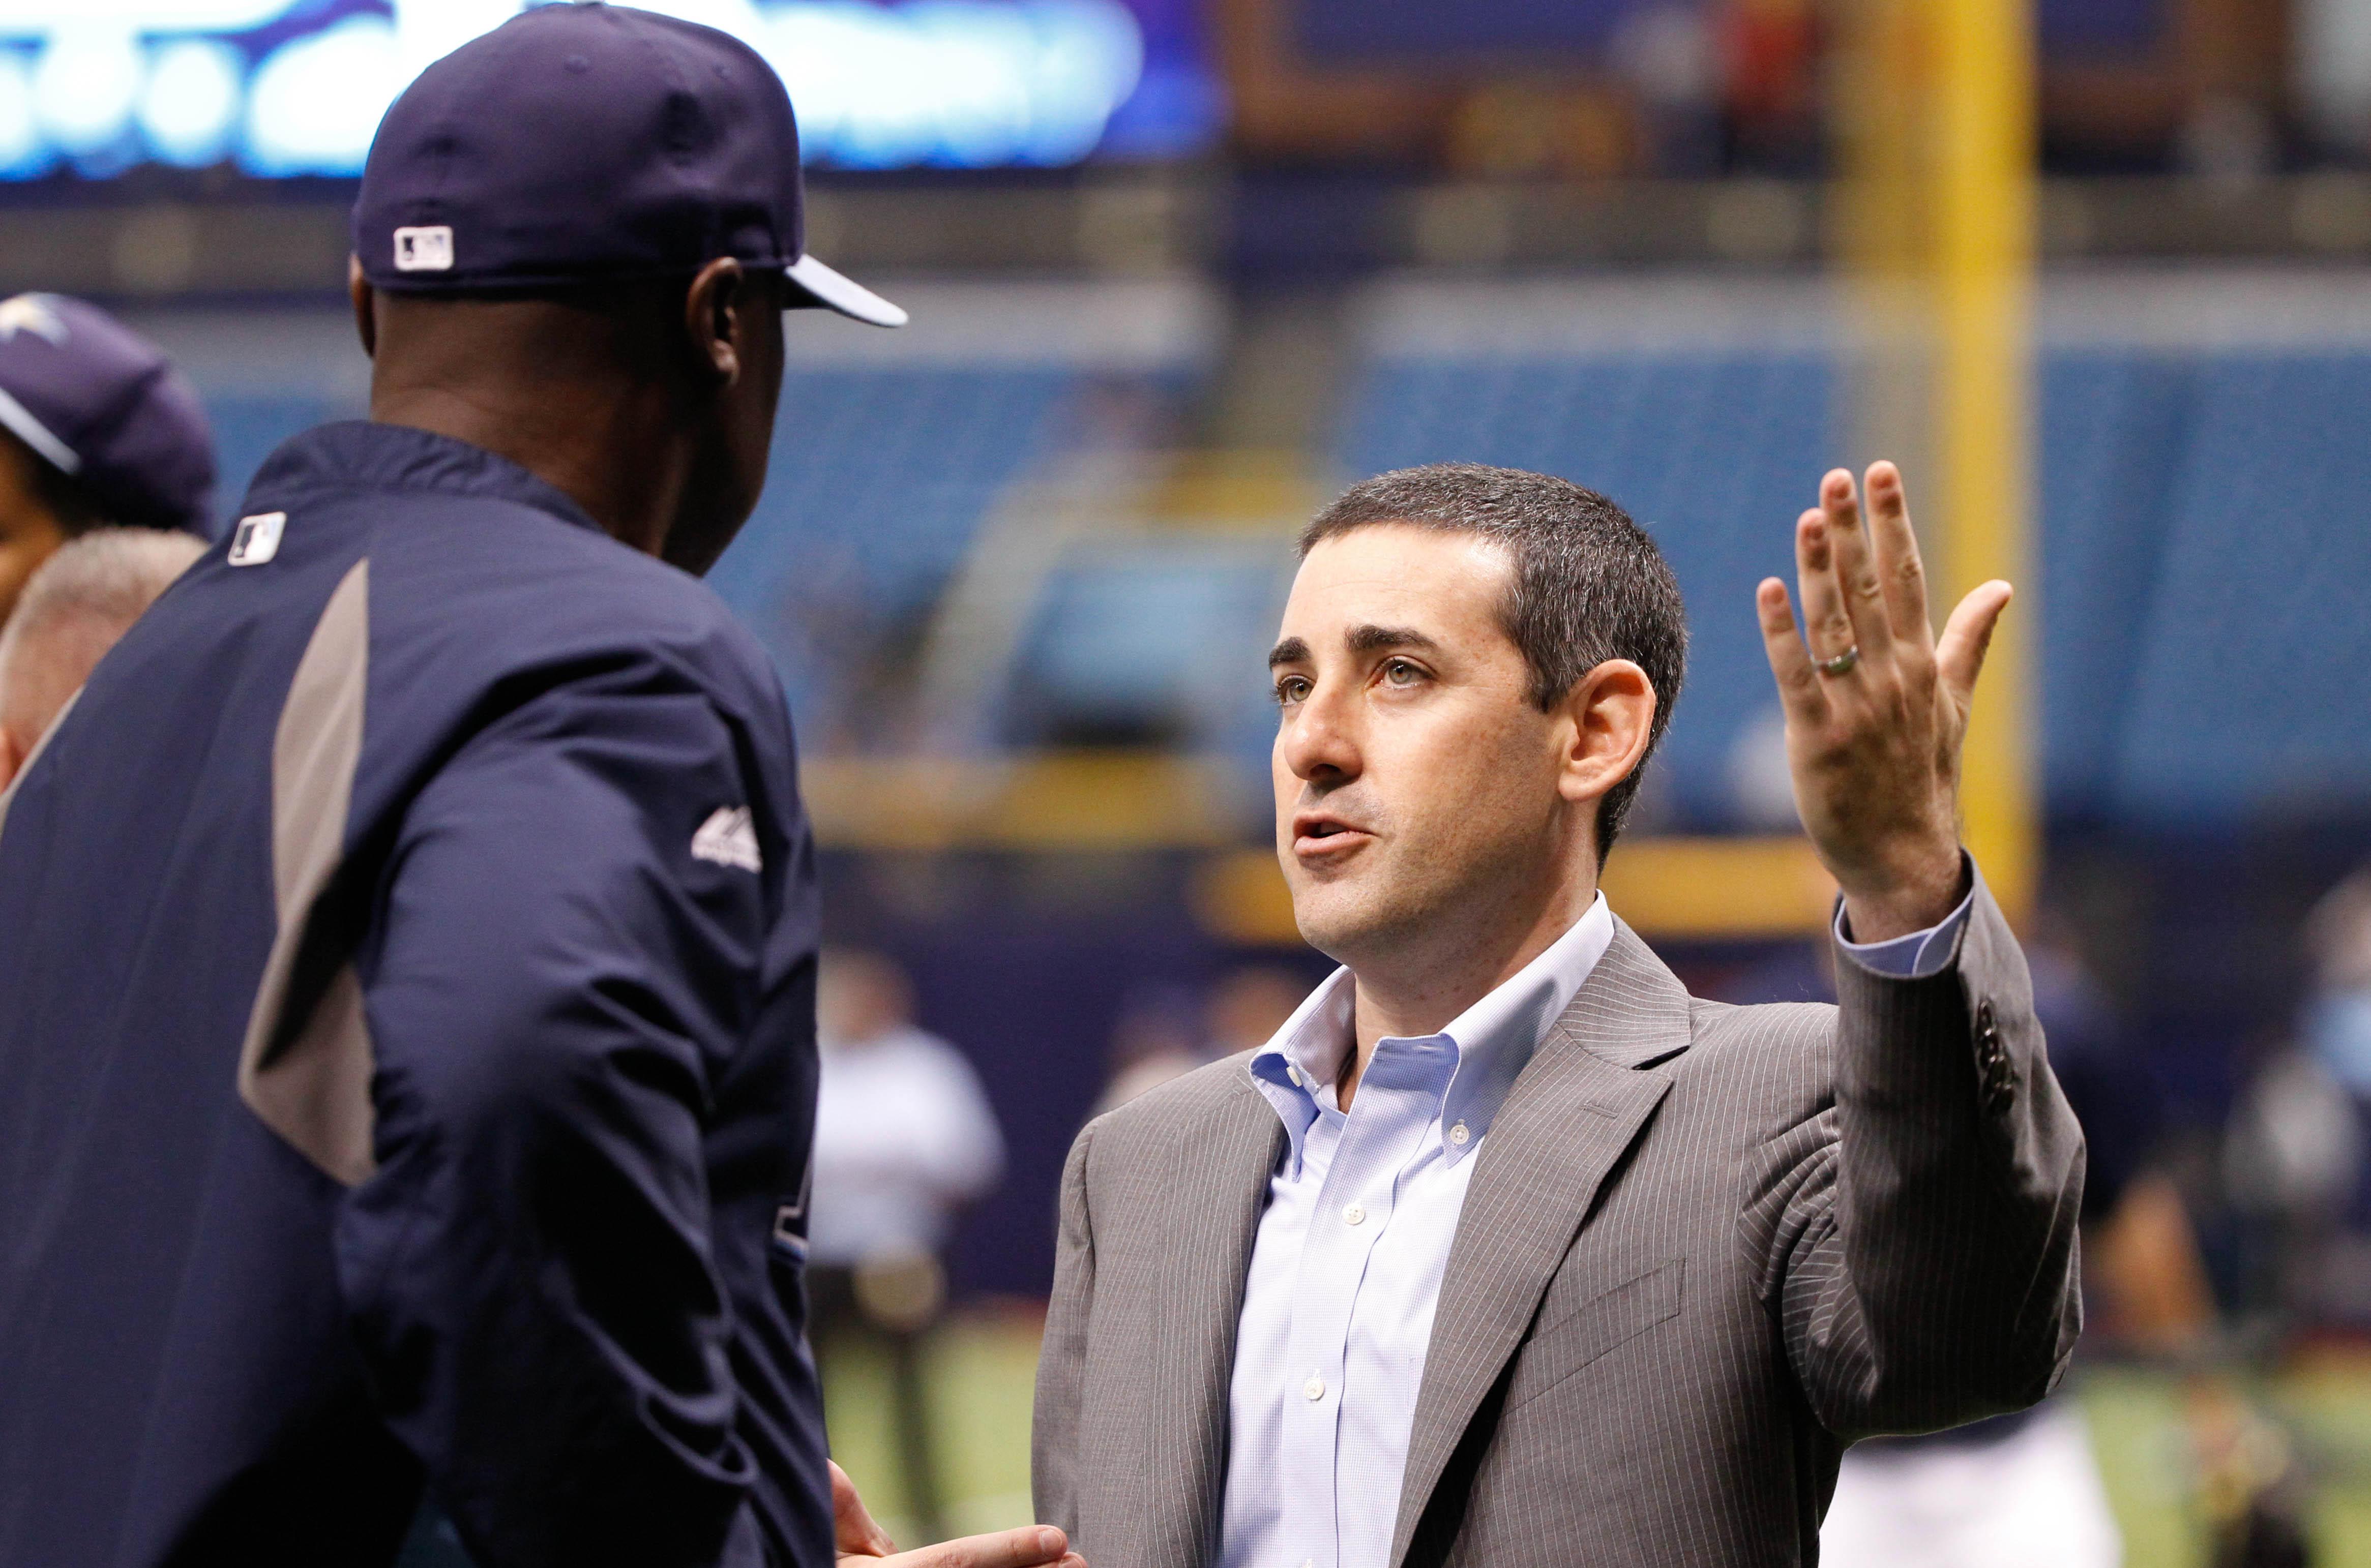 Matt Silverman talks with former first base coach George Hendrick